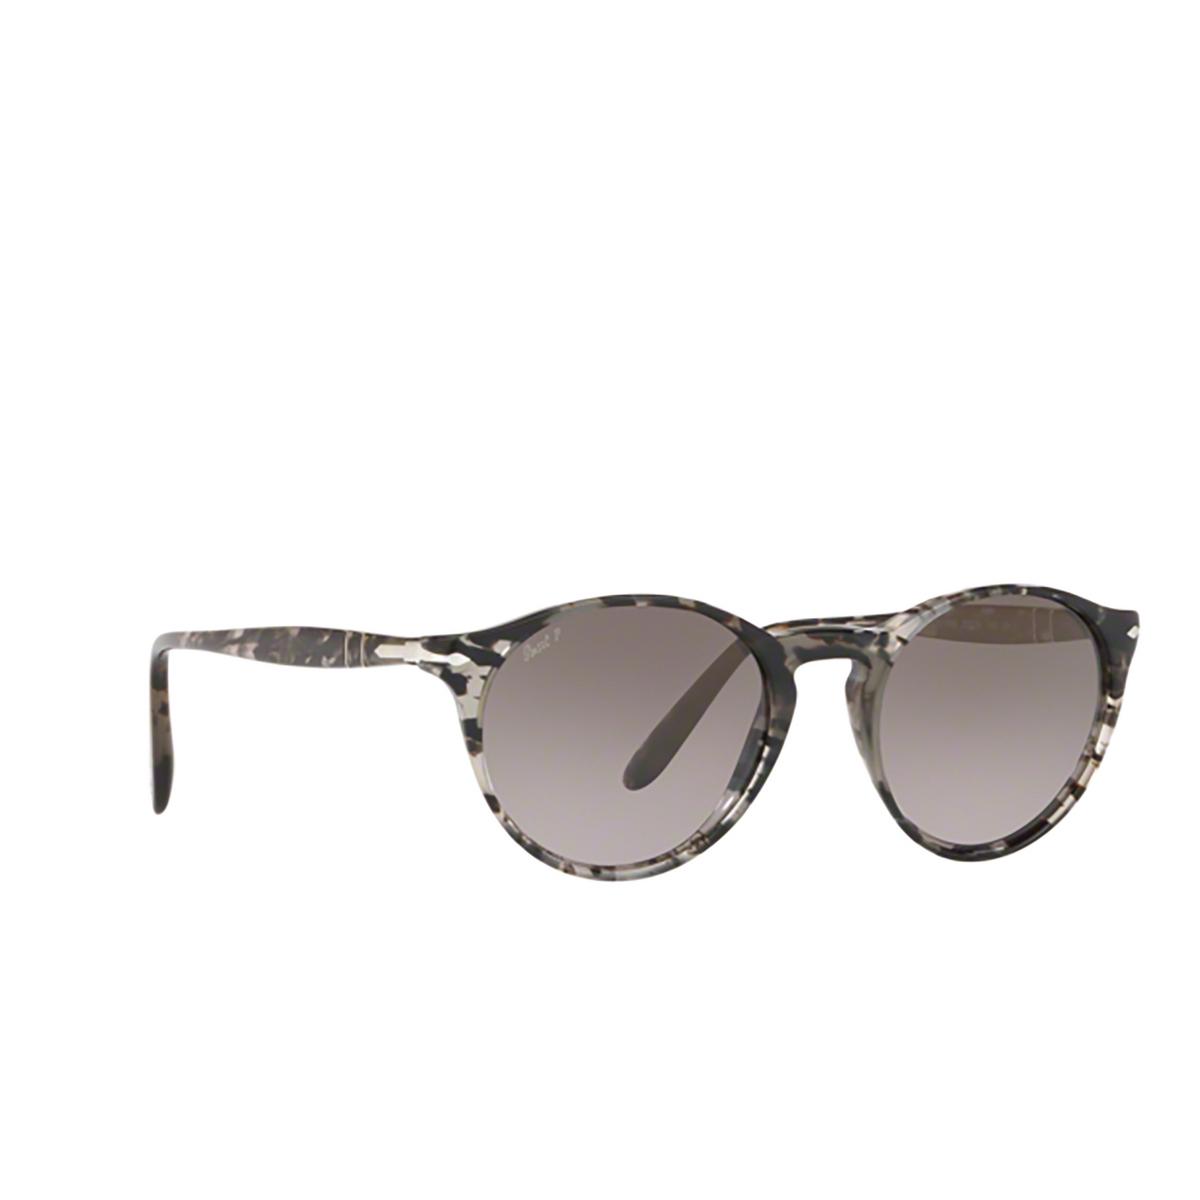 Persol® Round Sunglasses: PO3092SM color Grey Tortoise 9057M3 - three-quarters view.